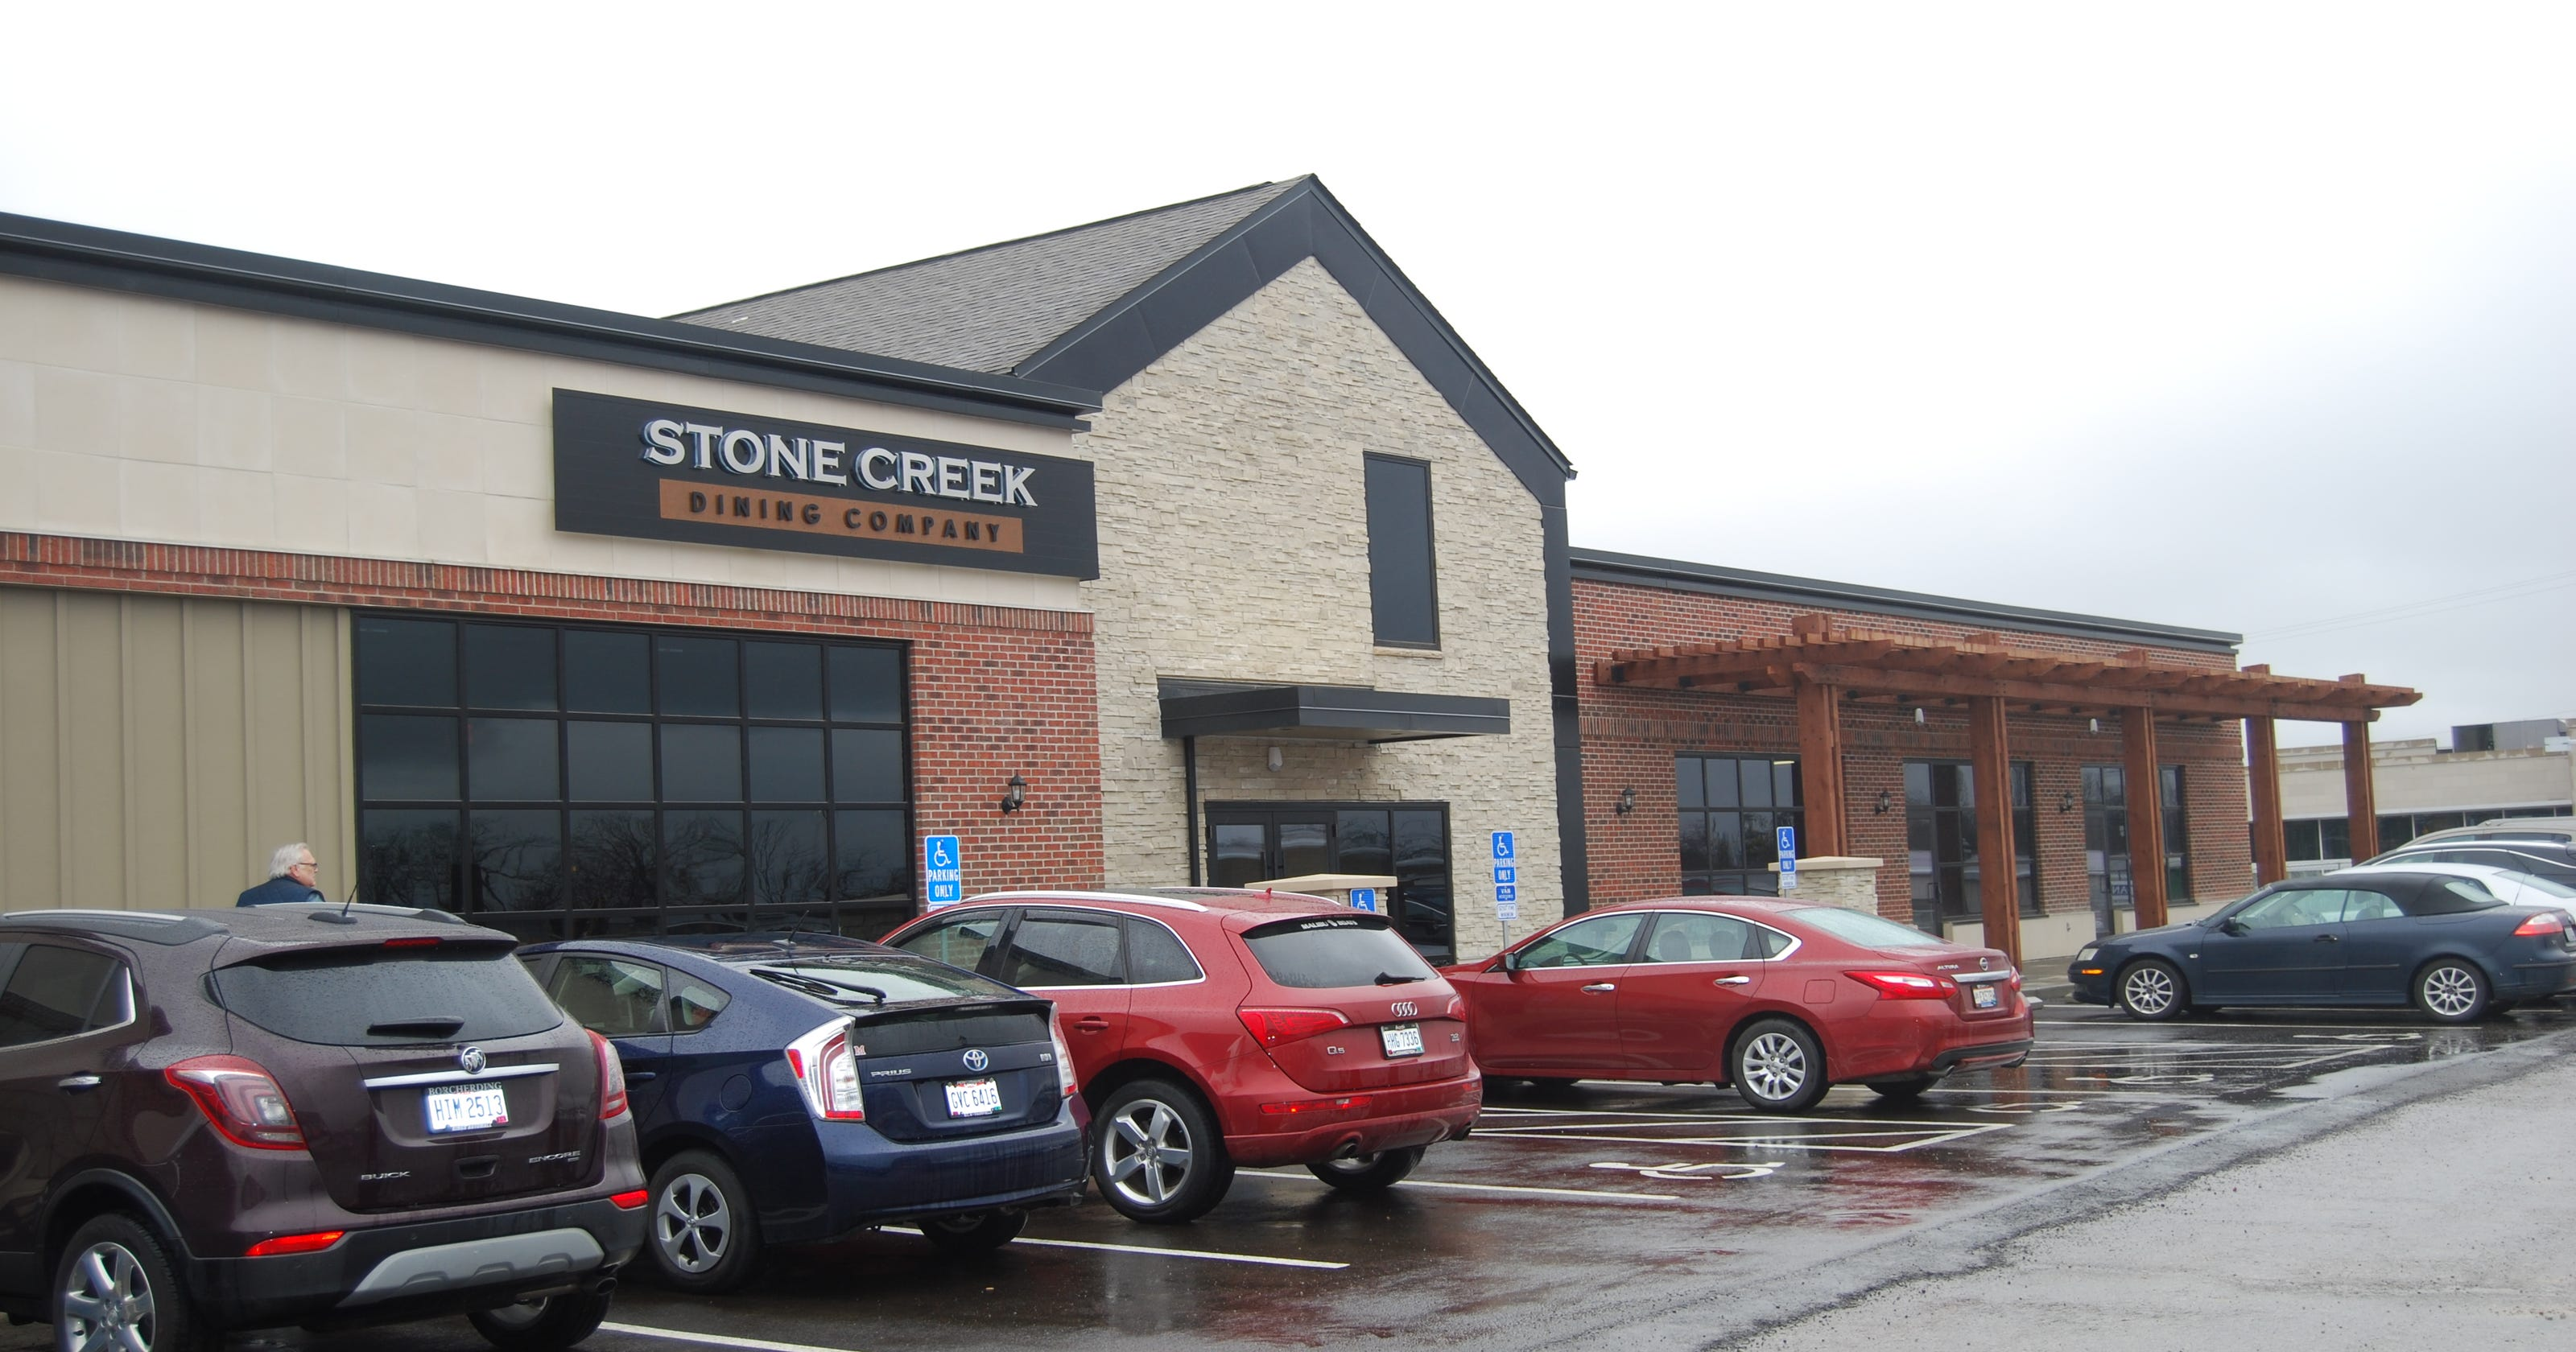 New Stone Creek Dining Company restaurant is bigger